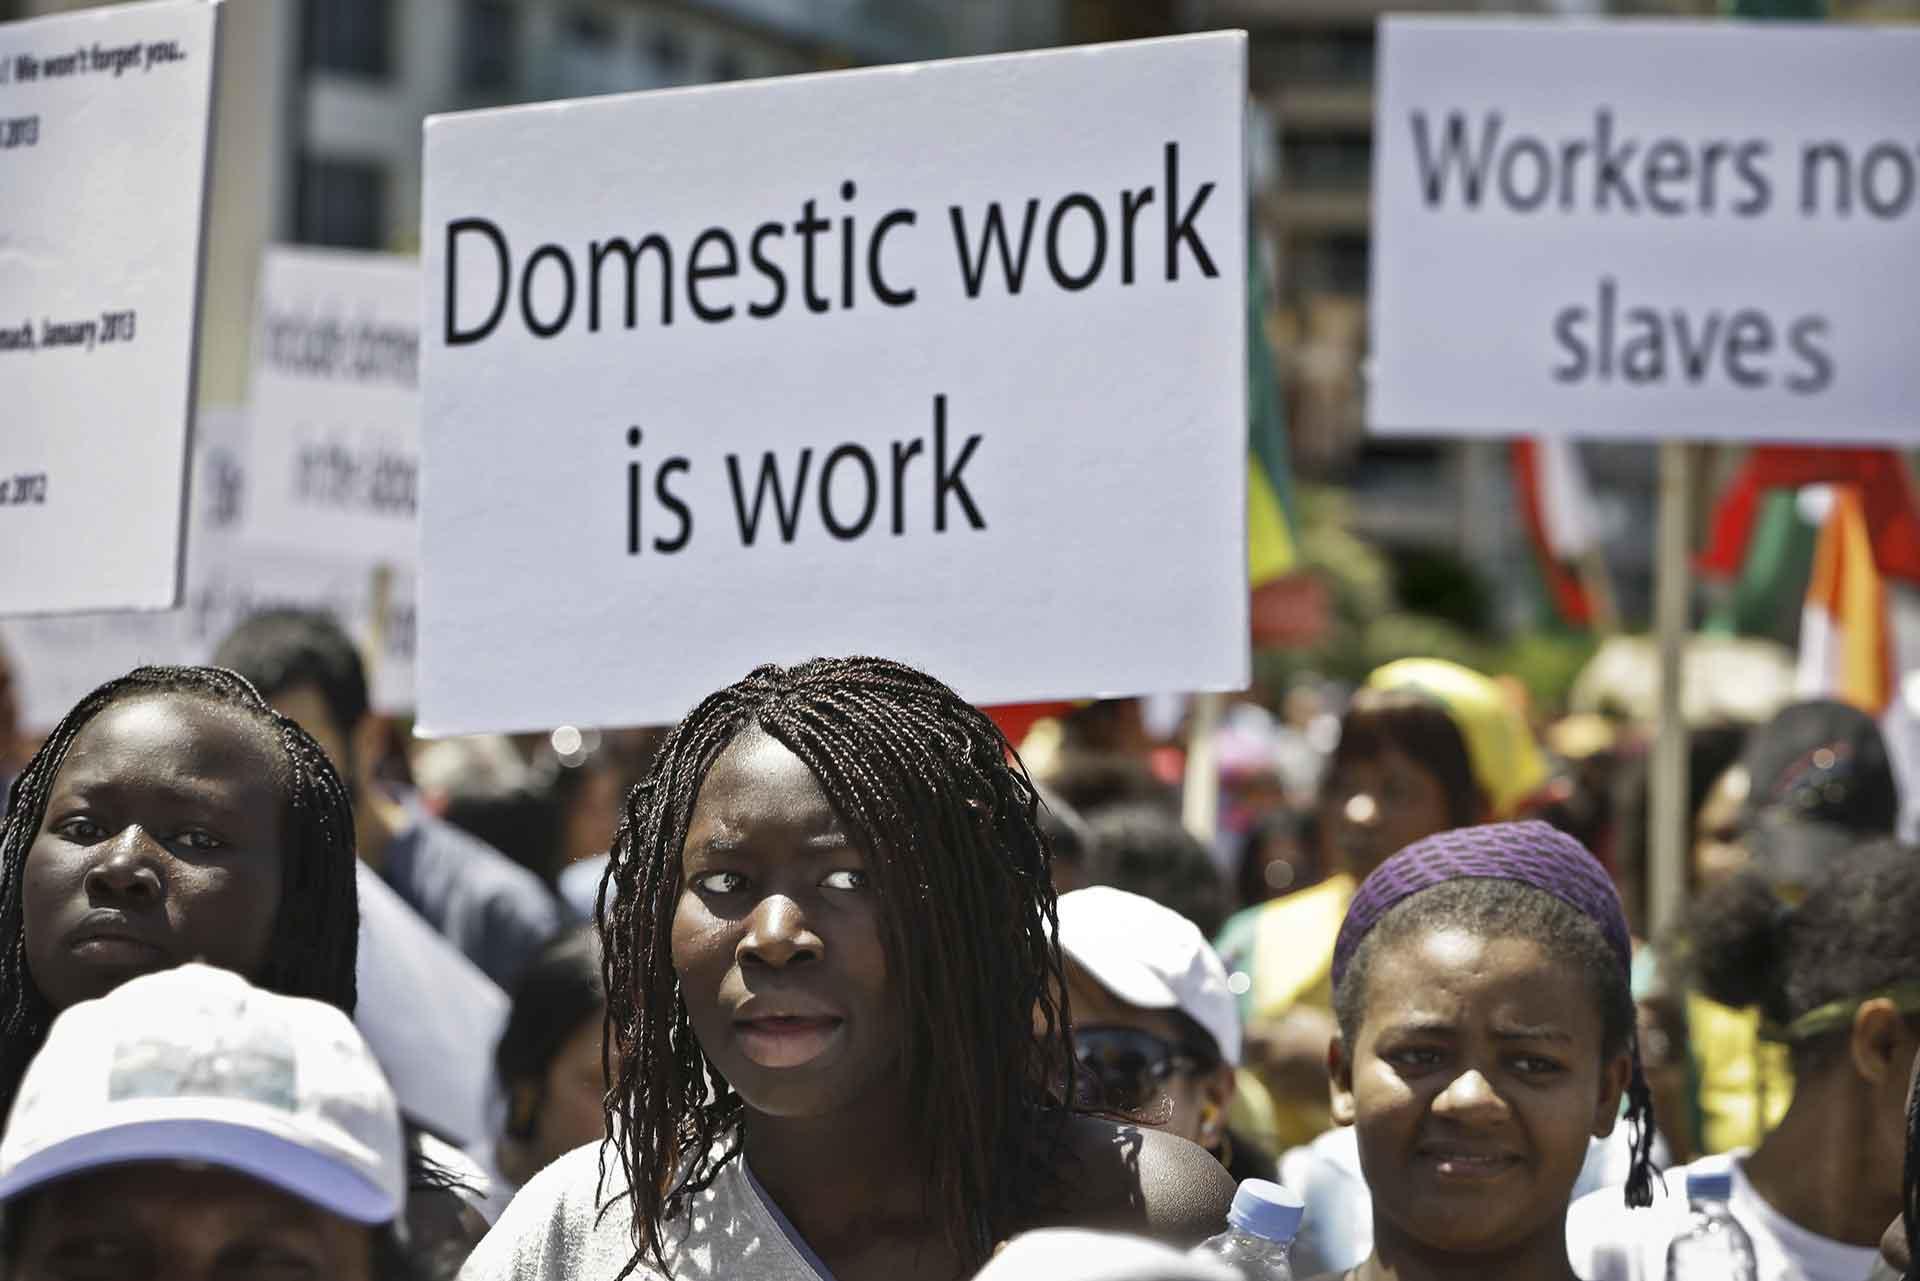 Arab Racism, Black Female Abuse, Domestic Abuse, Domestic Worker Abuse, KOLUMN Magazine, KOLUMN, KINDR'D Magazine, KINDR'D